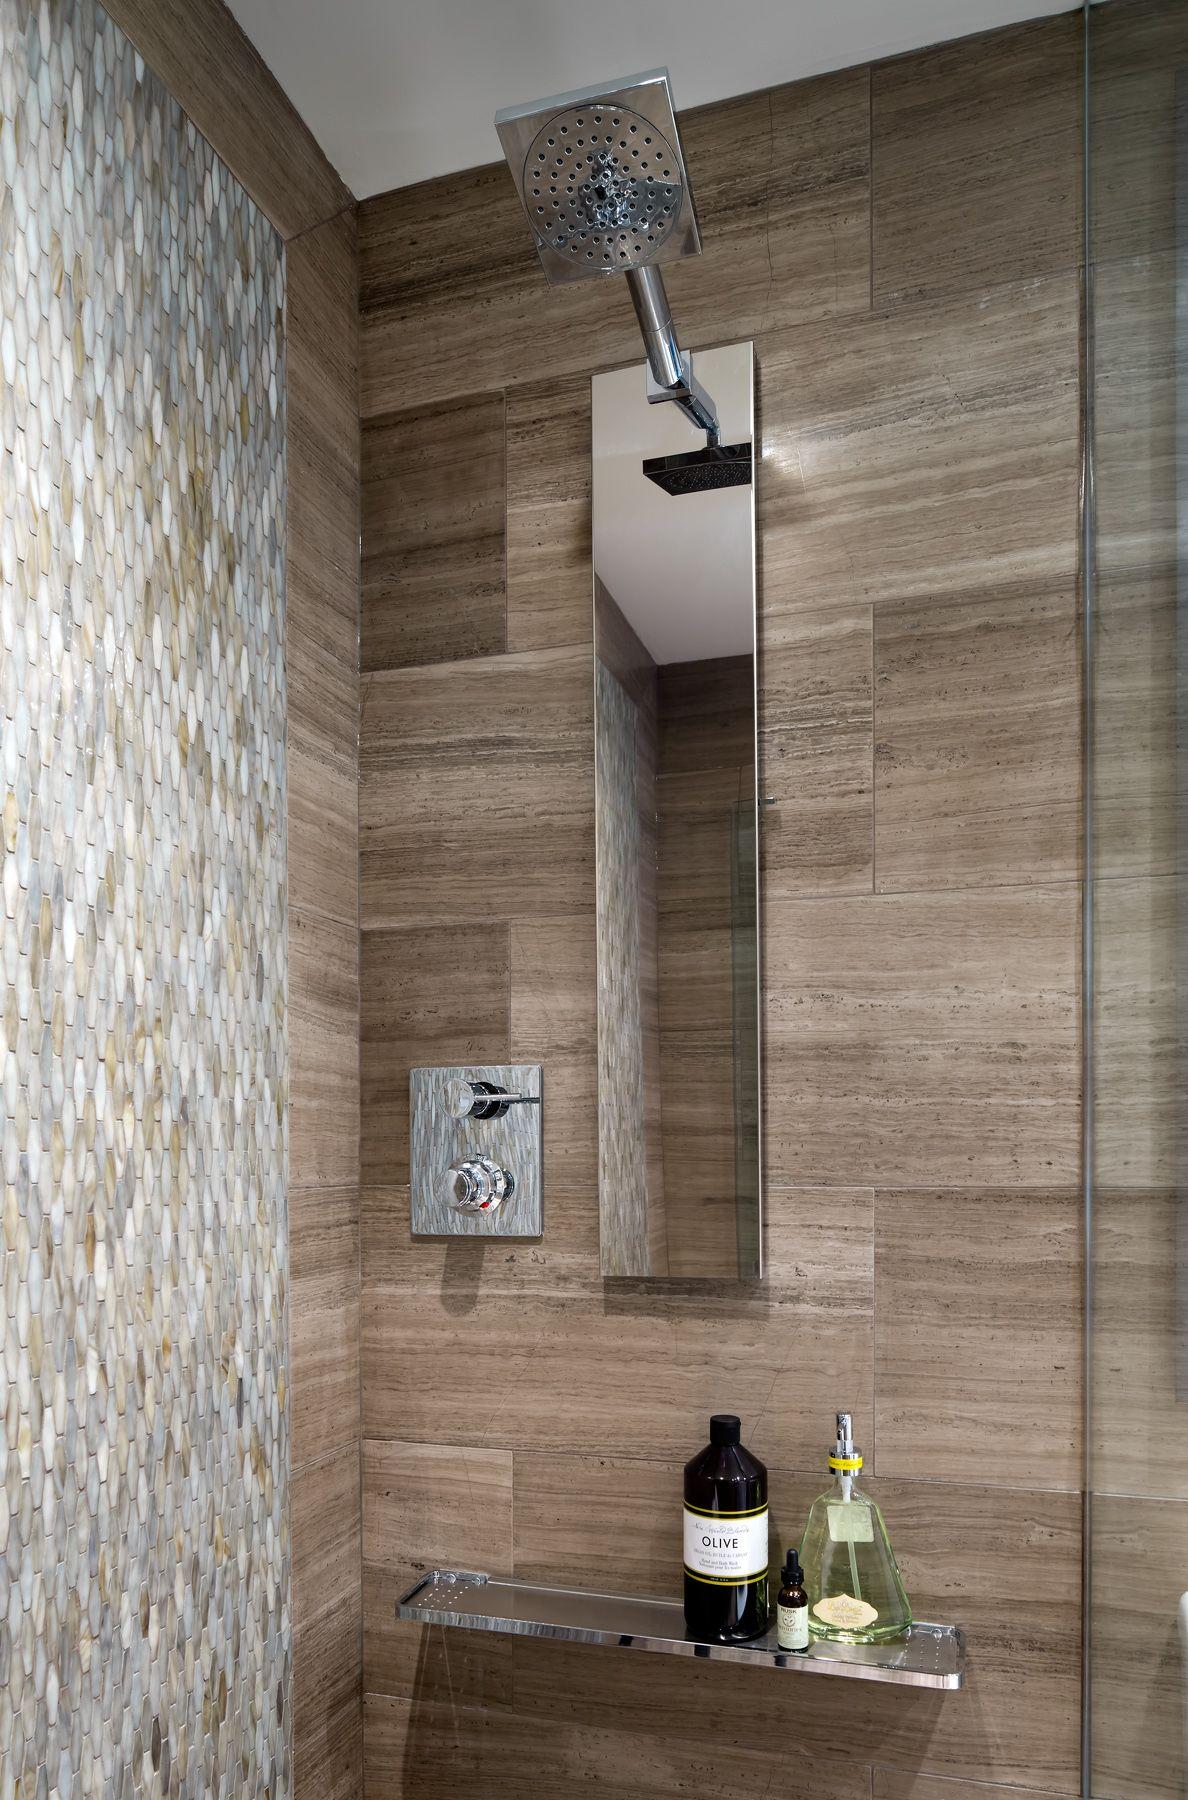 Pin By A Dallatorre On Beautiful Living Toilet Design Shower Design Toronto Interior Design